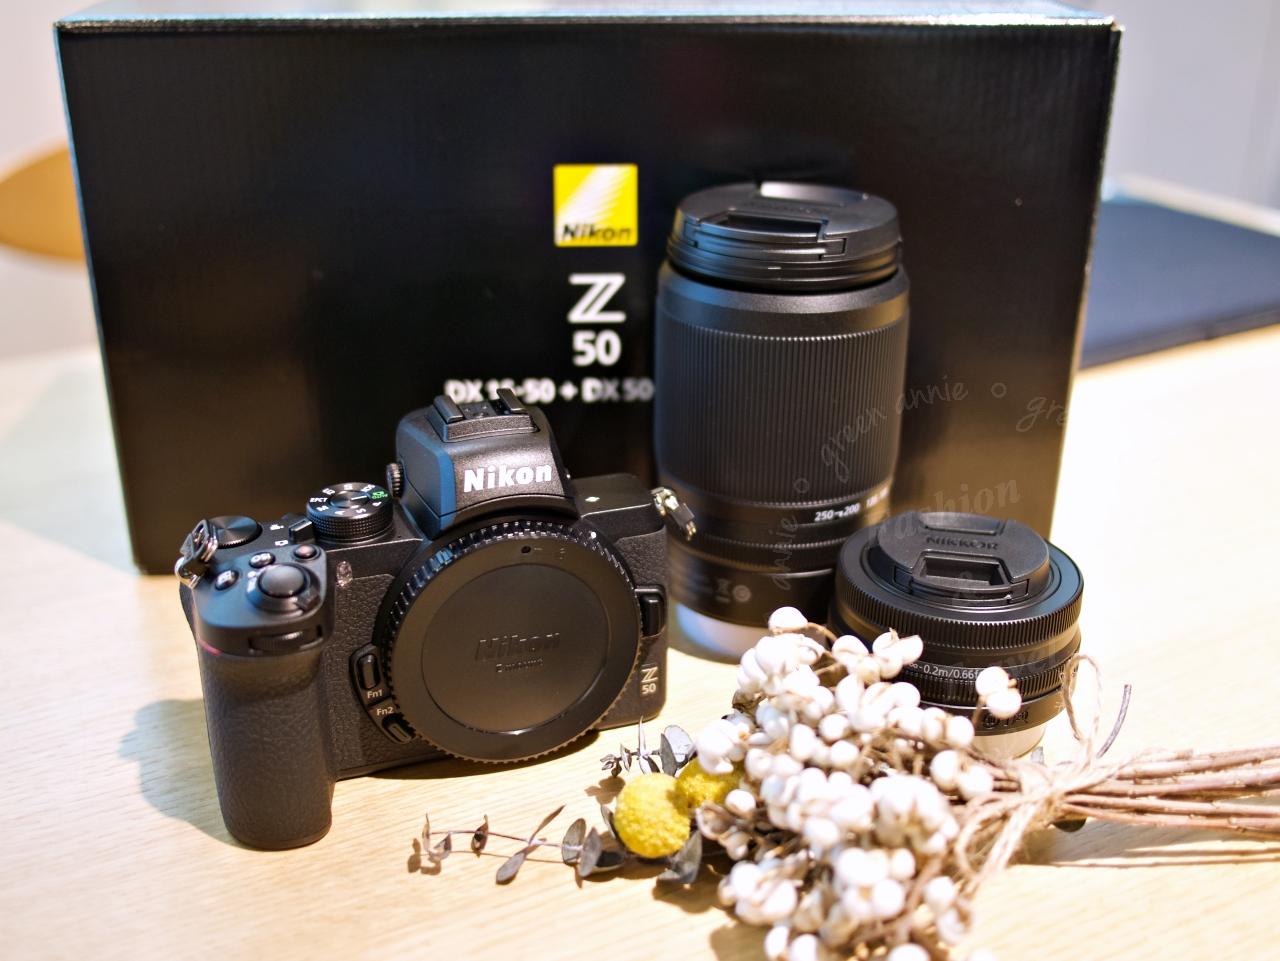 Nikon APS-C 無反微單 Z50 開賣了~kit鏡雙鏡組實物開箱(附心得、實拍影片)